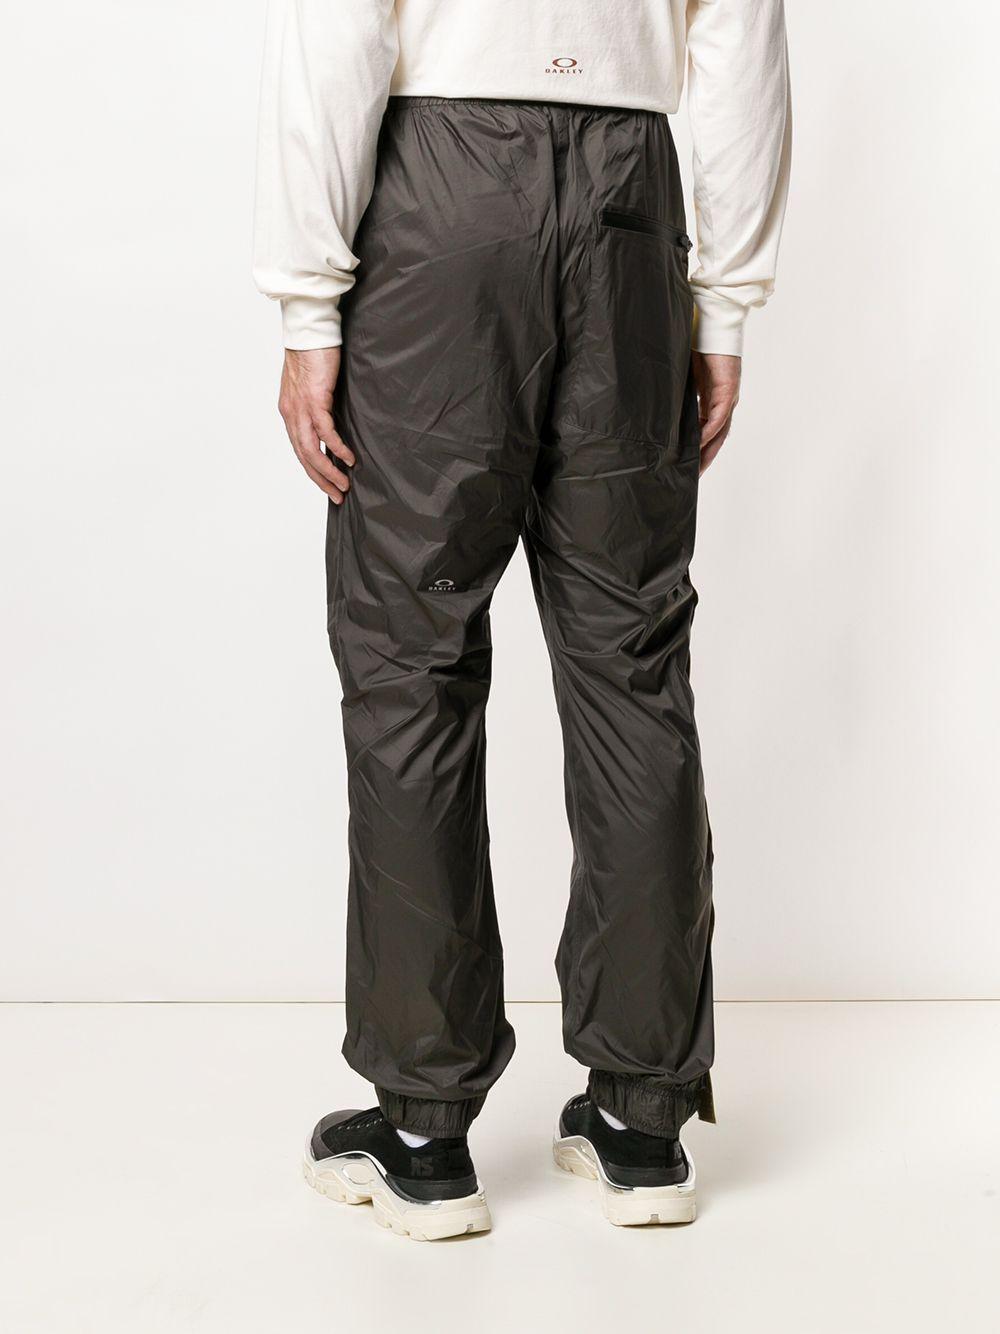 Oakley By Samuel Ross | спортивные брюки с боковыми полосками | Clouty